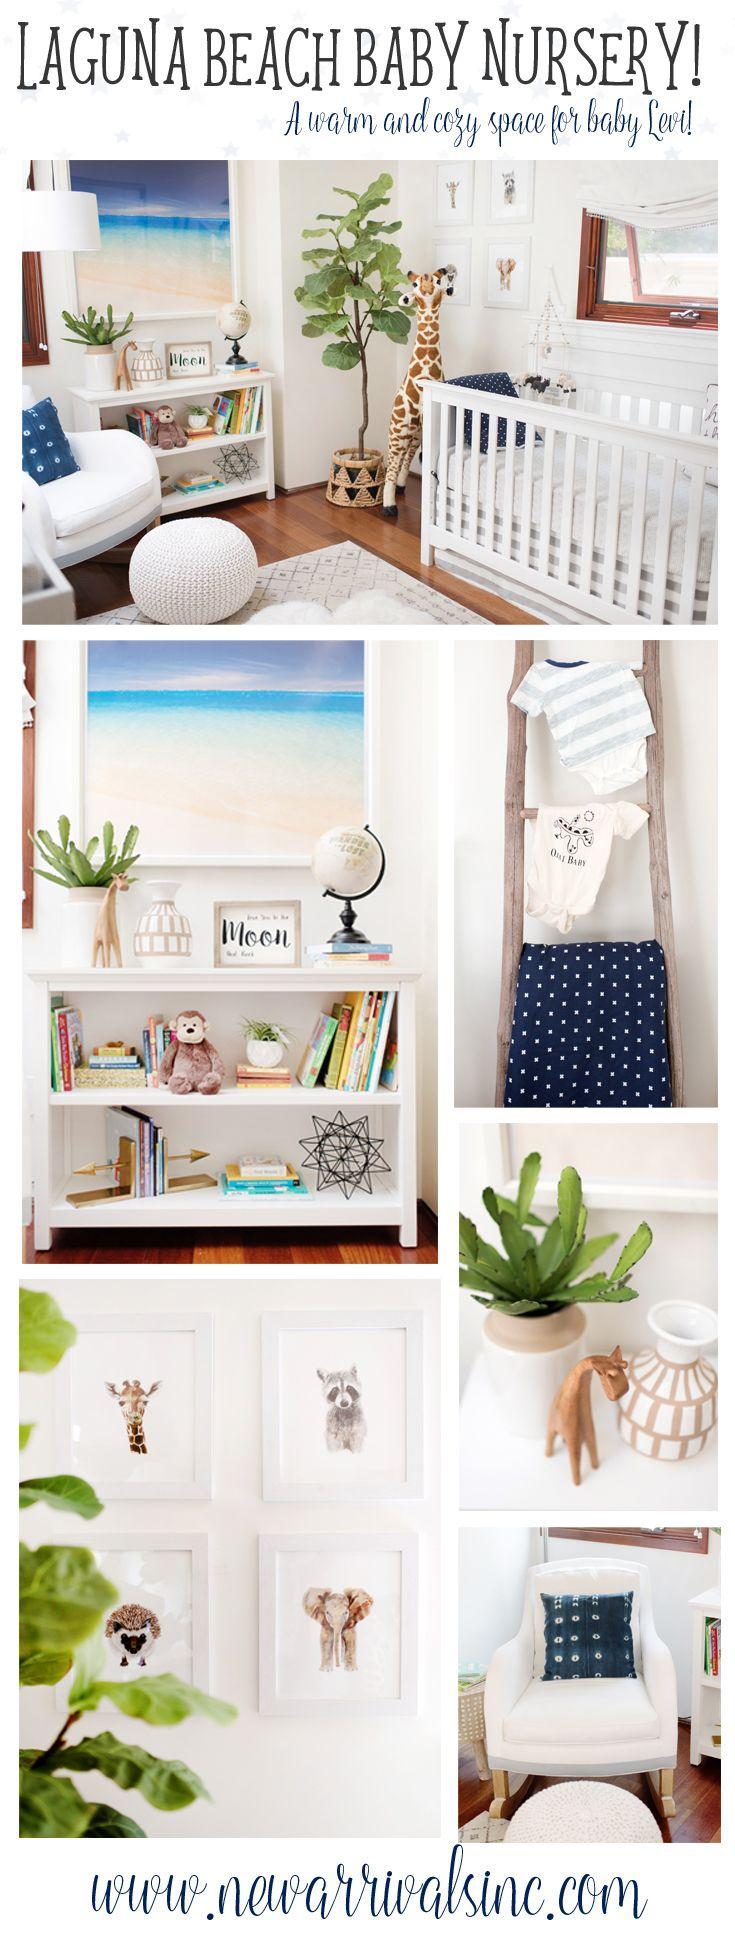 Celebrity Nurseries | Laguna Beach Alex Murrel's room for Baby Levi!